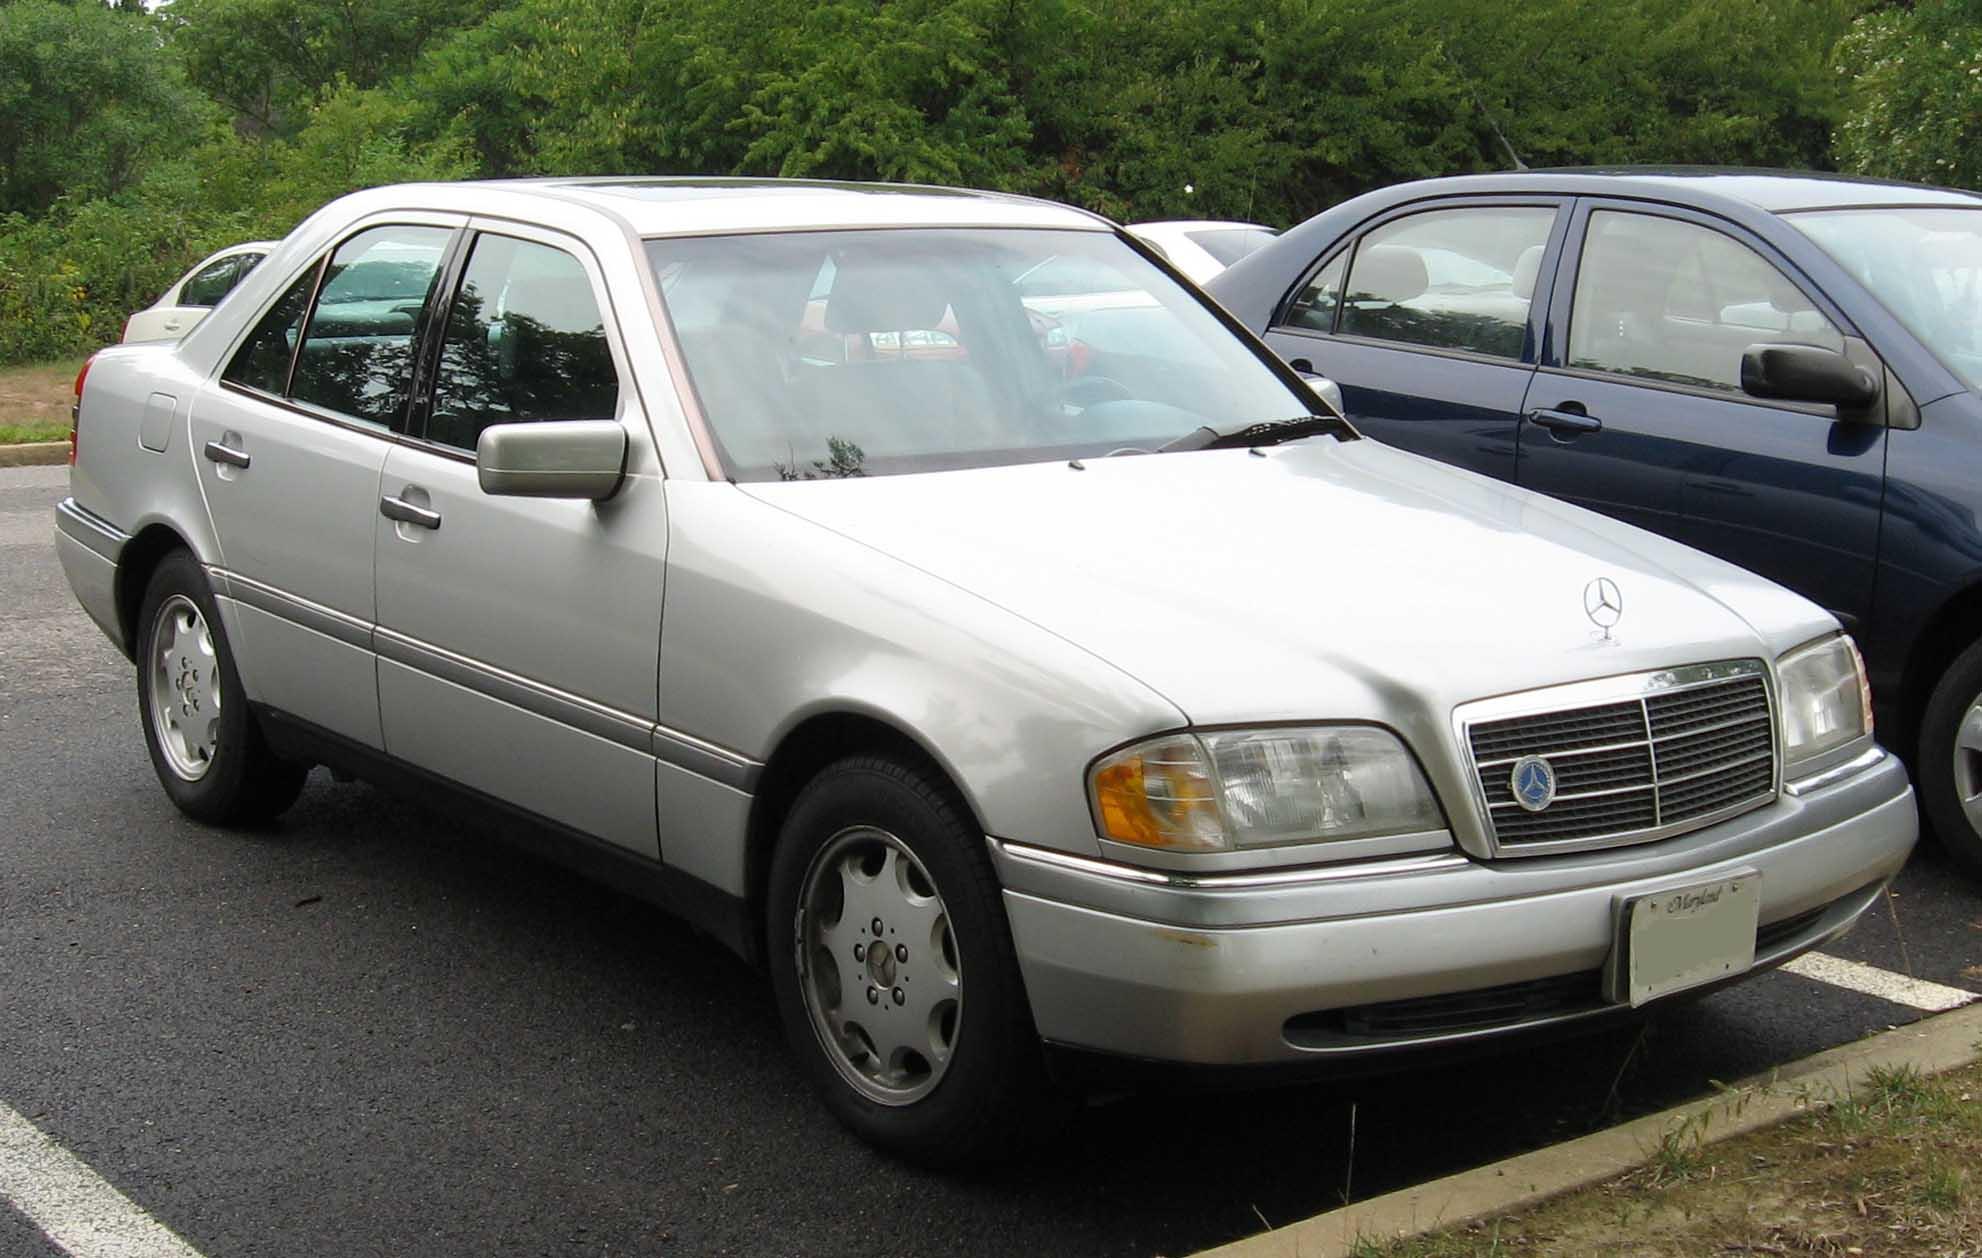 Mercedes-Benz C-klasse I (W202) Restyling 1997 - 2000 Station wagon 5 door #3